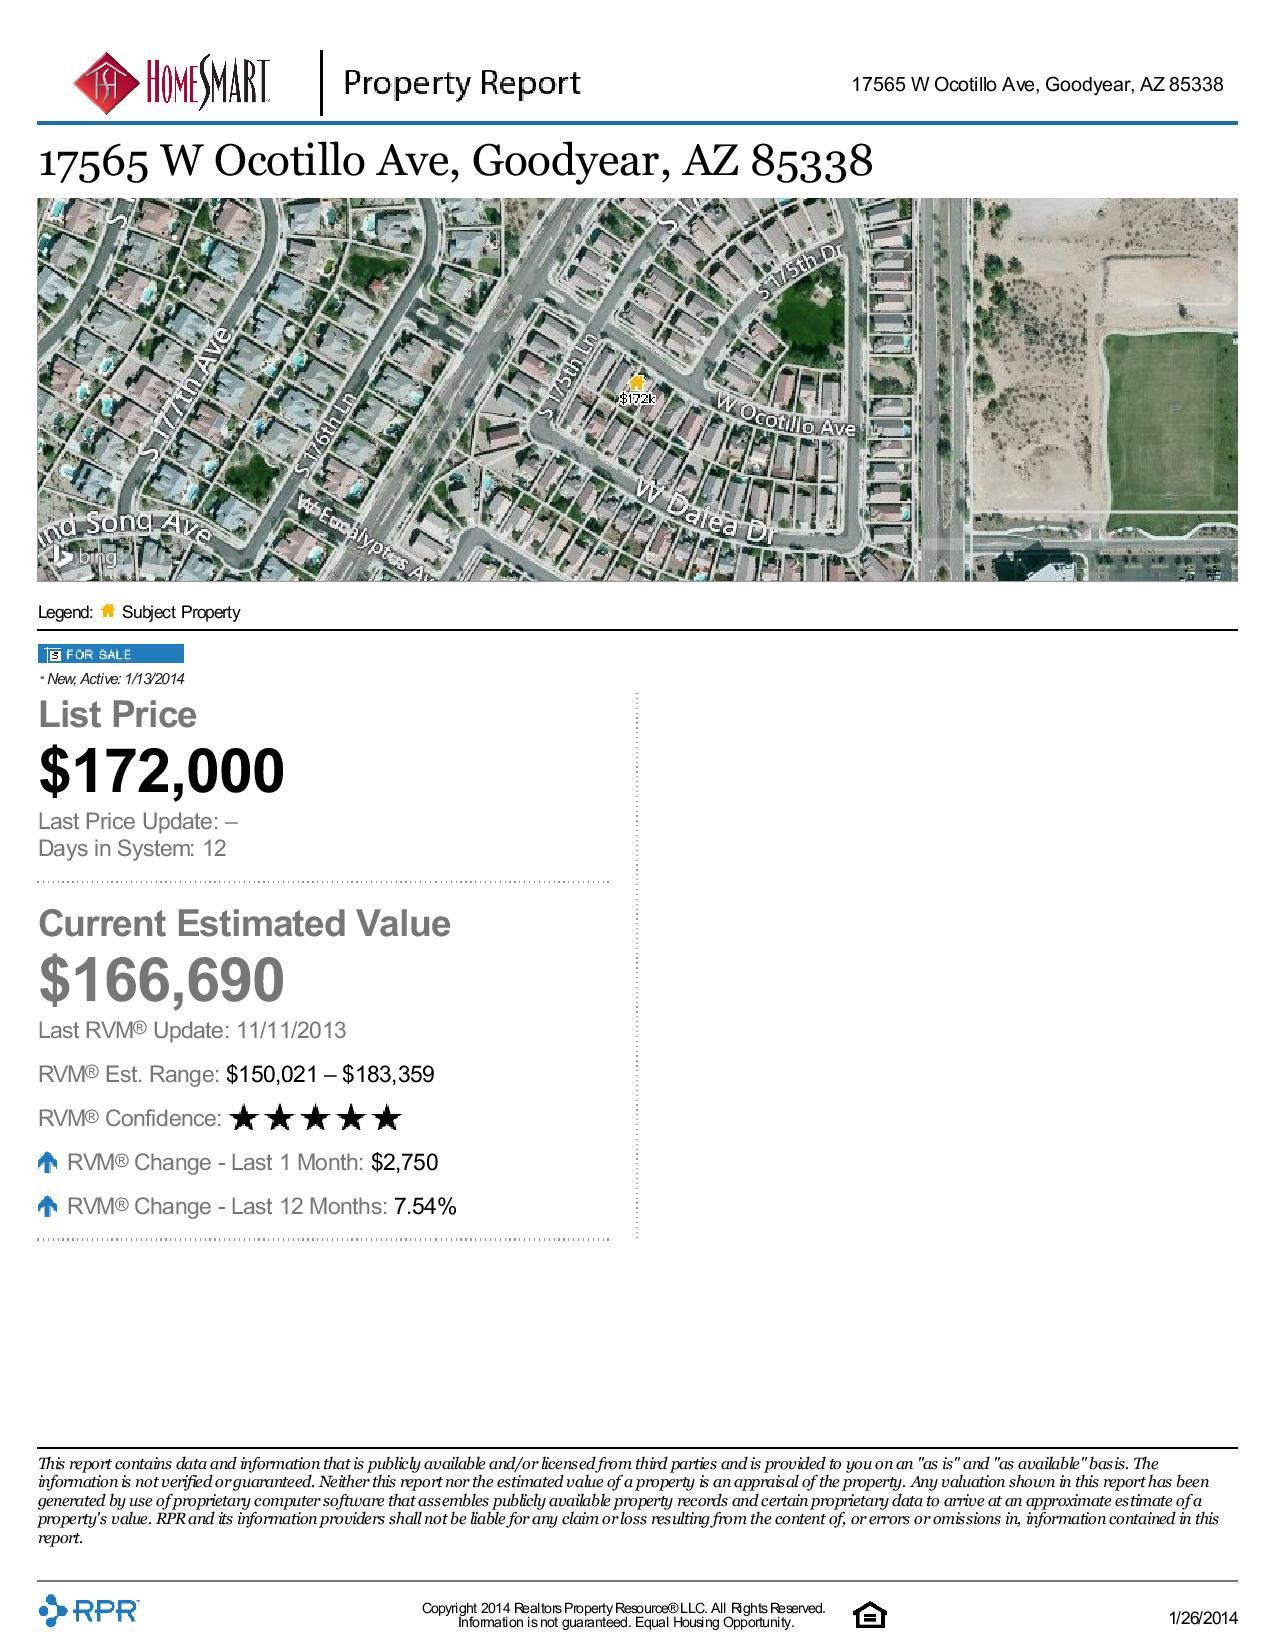 17565-W-Ocotillo-Ave-Goodyear-AZ-85338.pdf-page-002